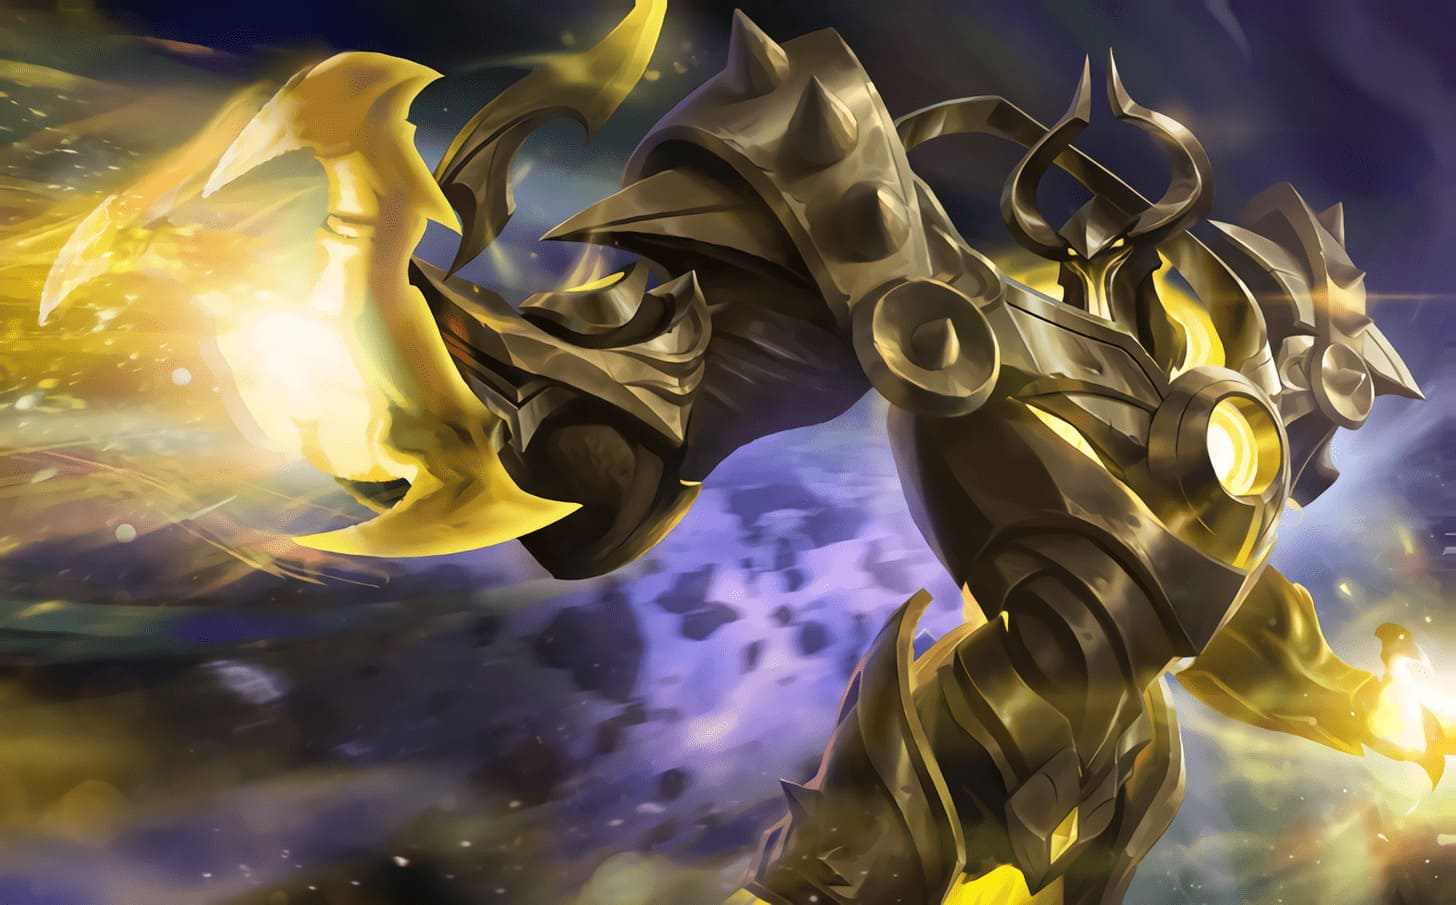 Wallpaper Uranus Aethereal Defender Skin Mobile Legends HD for PC